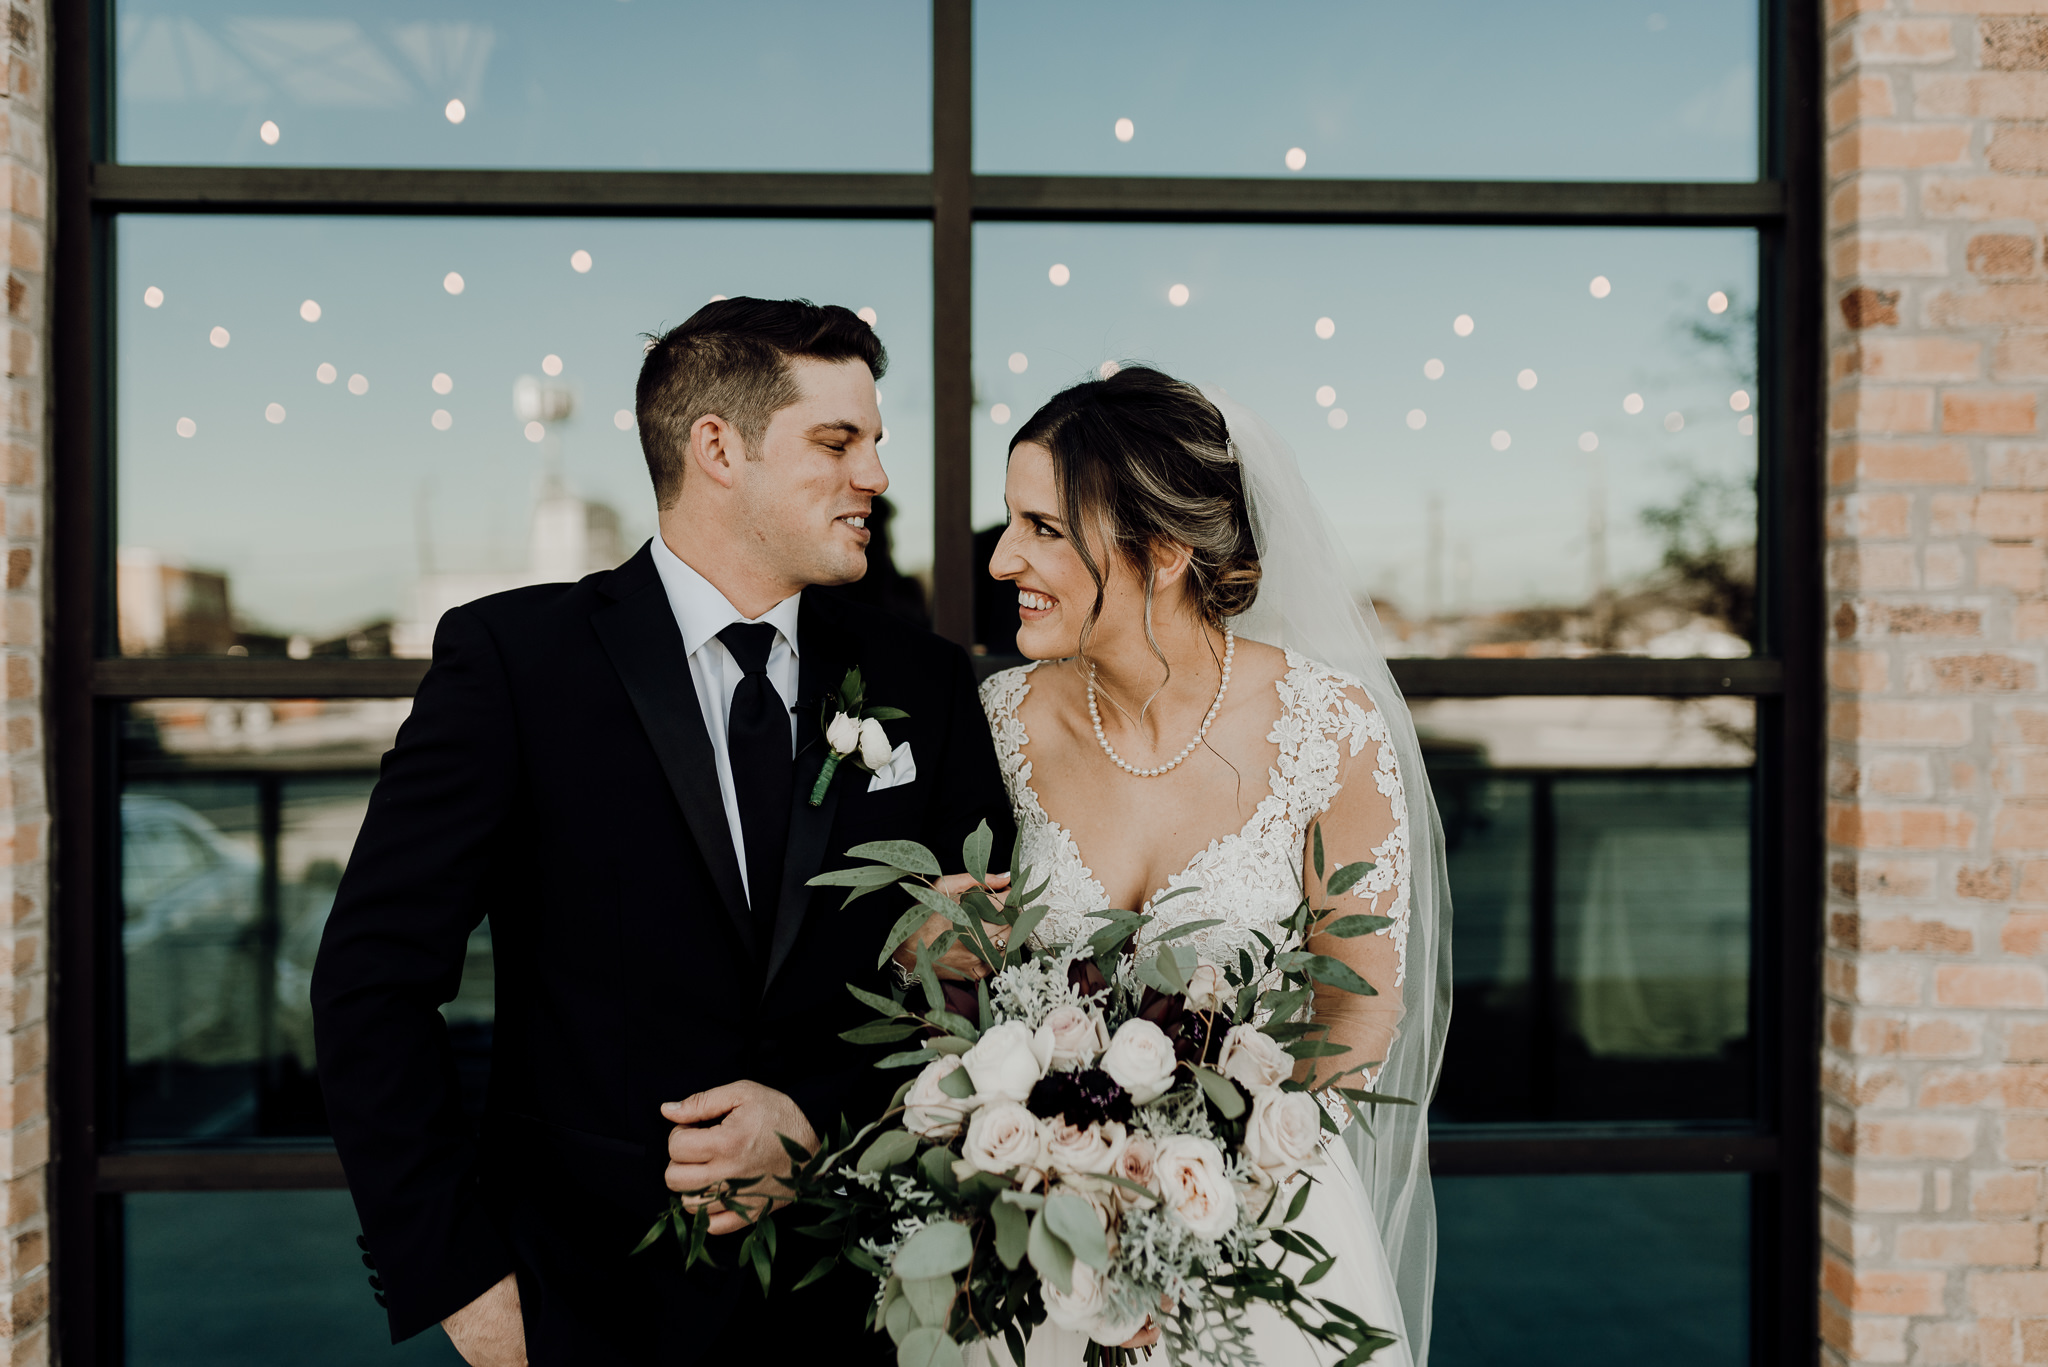 Allie + Colton   Kristen Giles Photography - 004.jpg